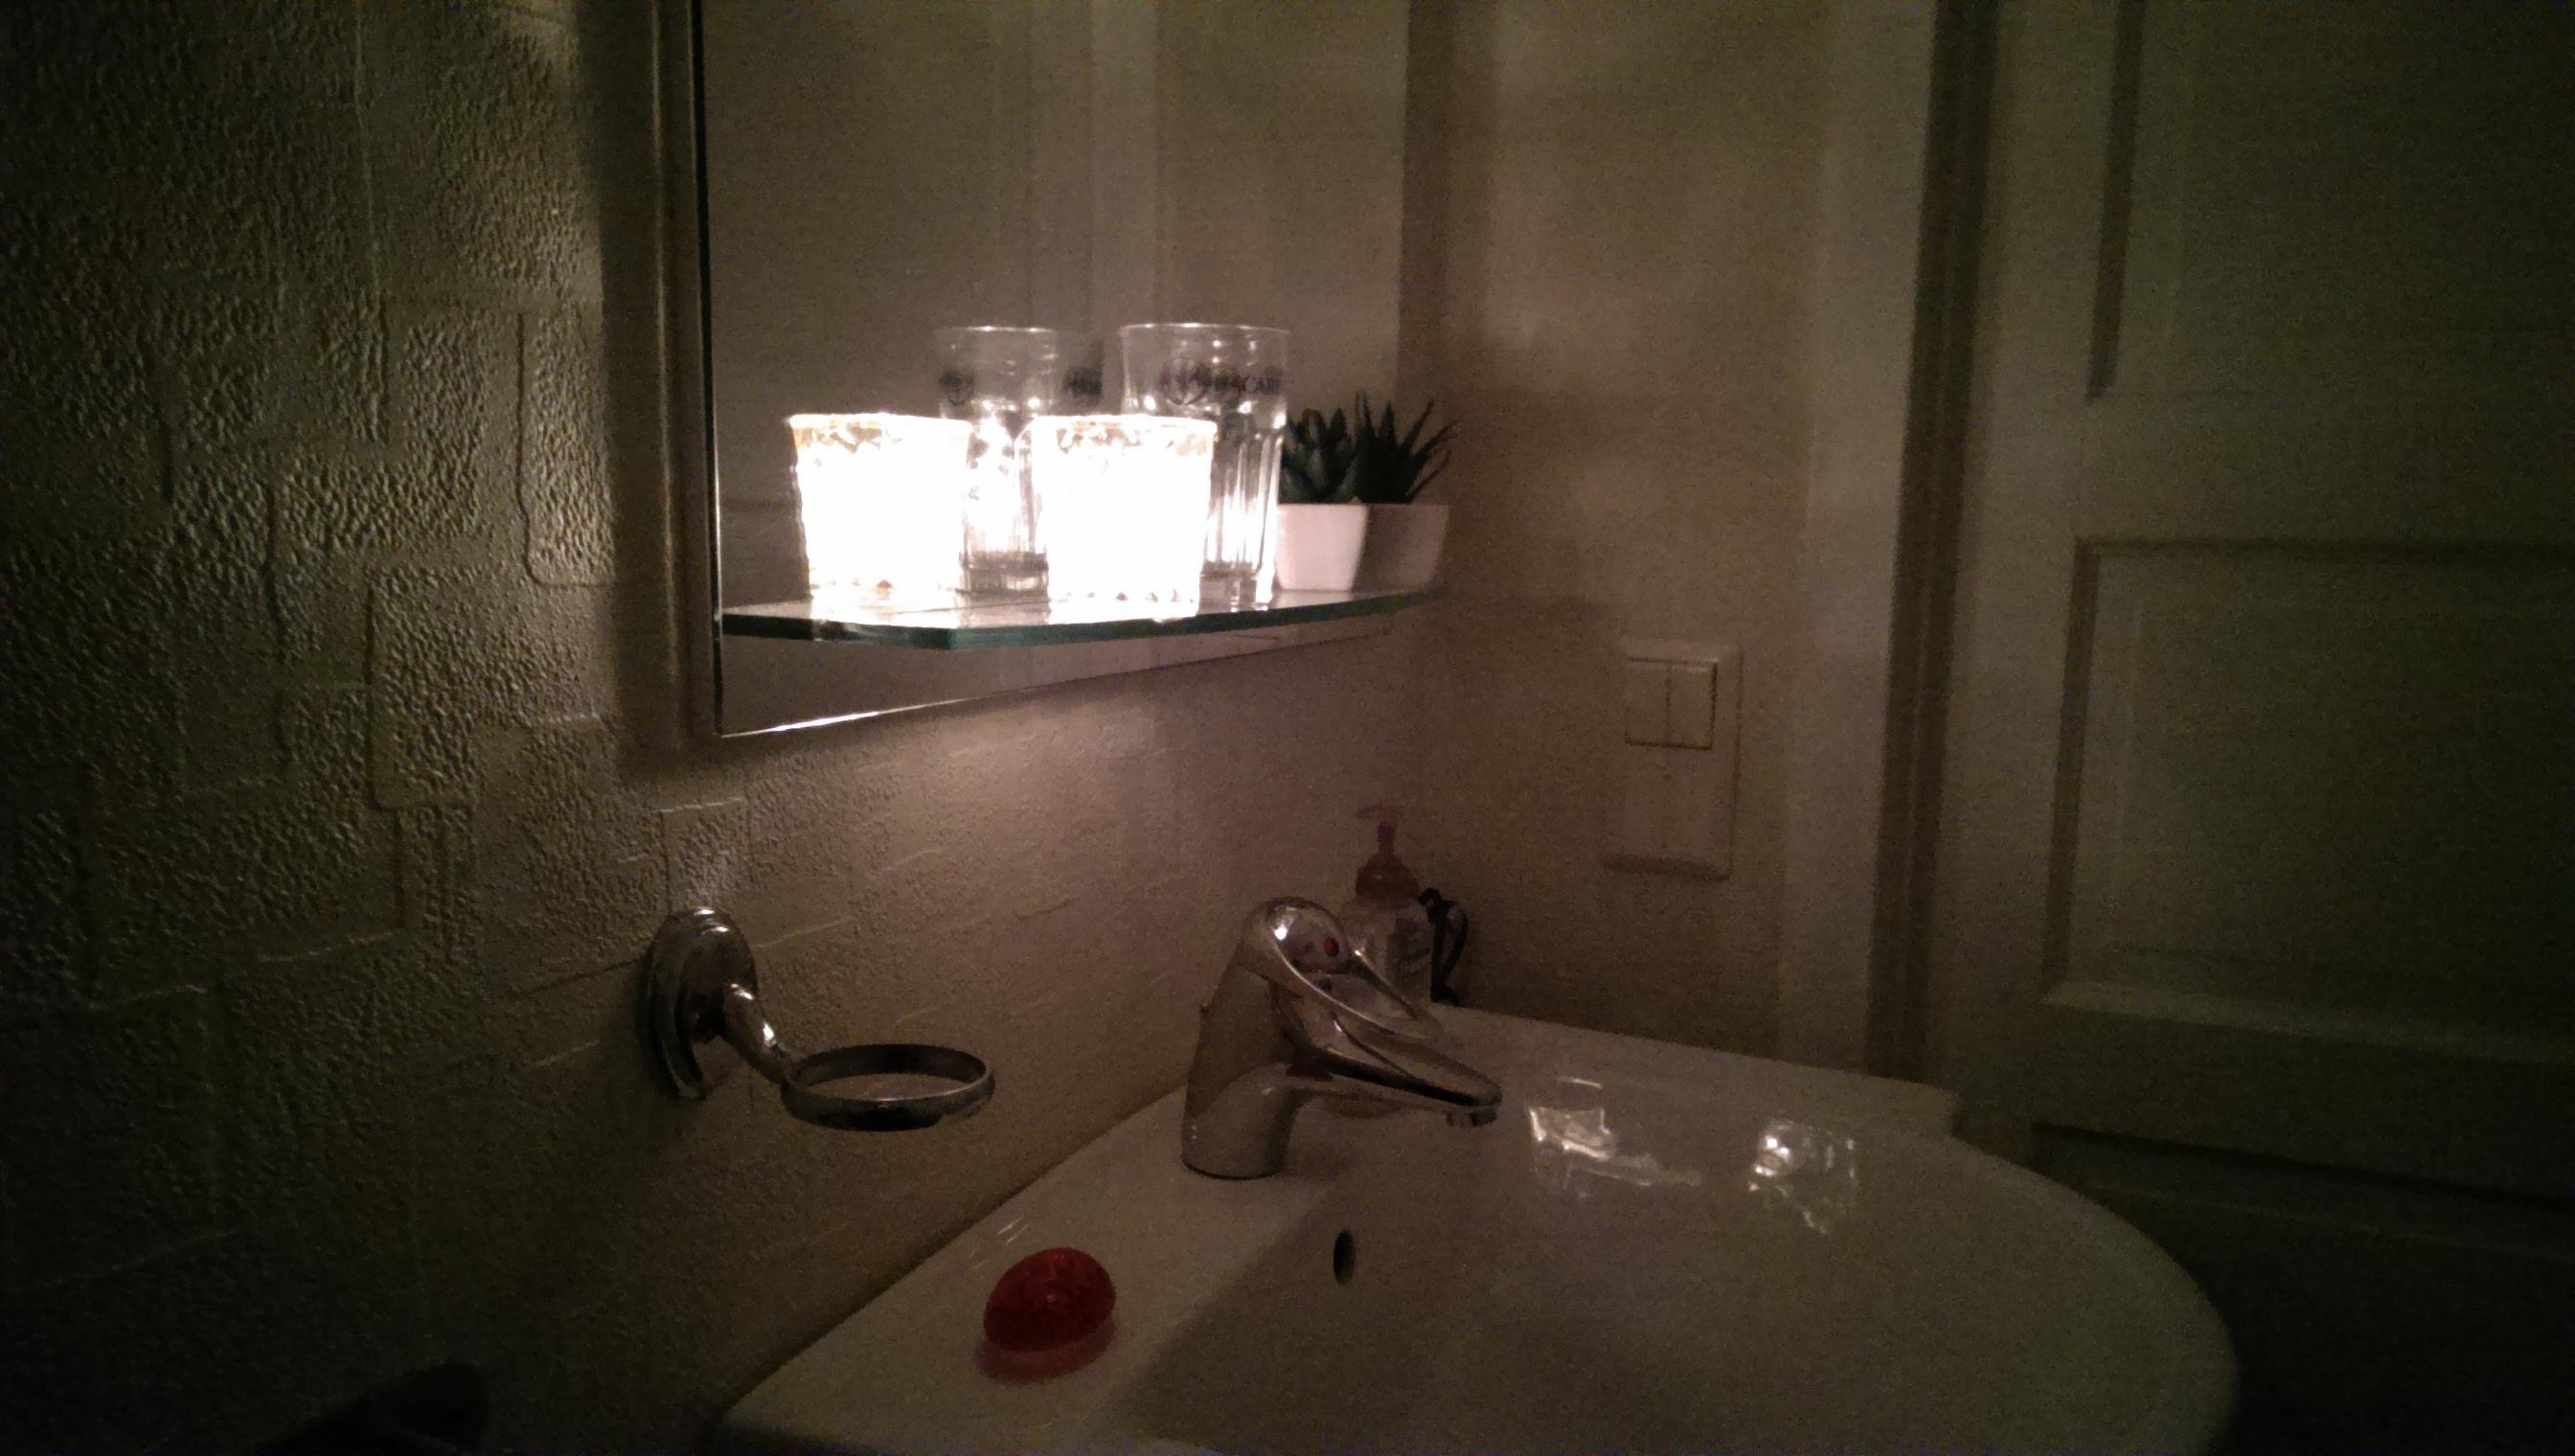 HTC One: Mørkt rom